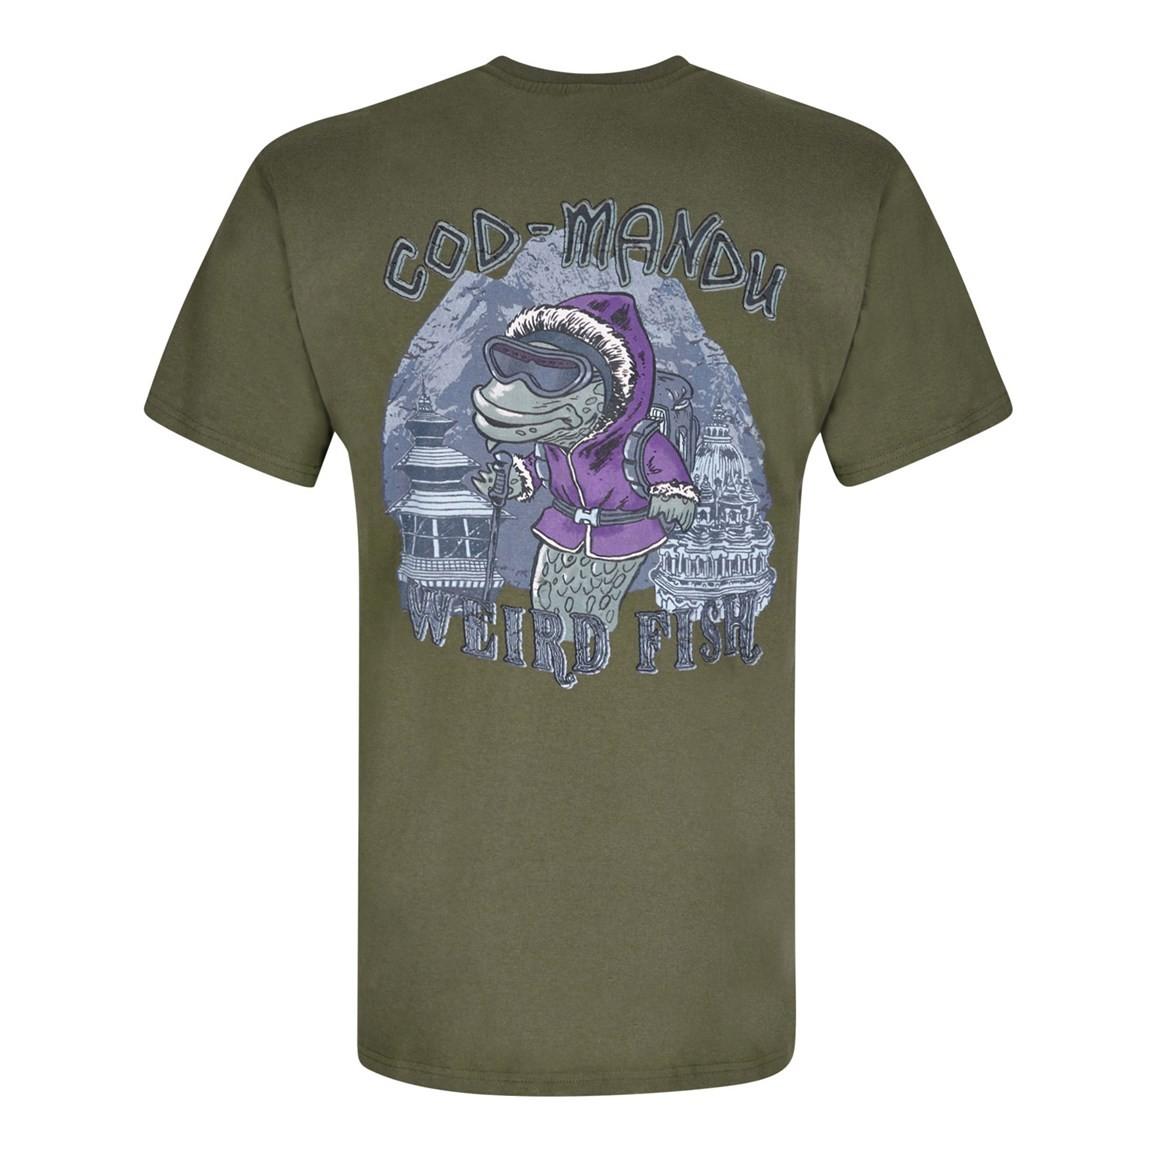 Cod Mandu Printed Artist T-Shirt Olive Night